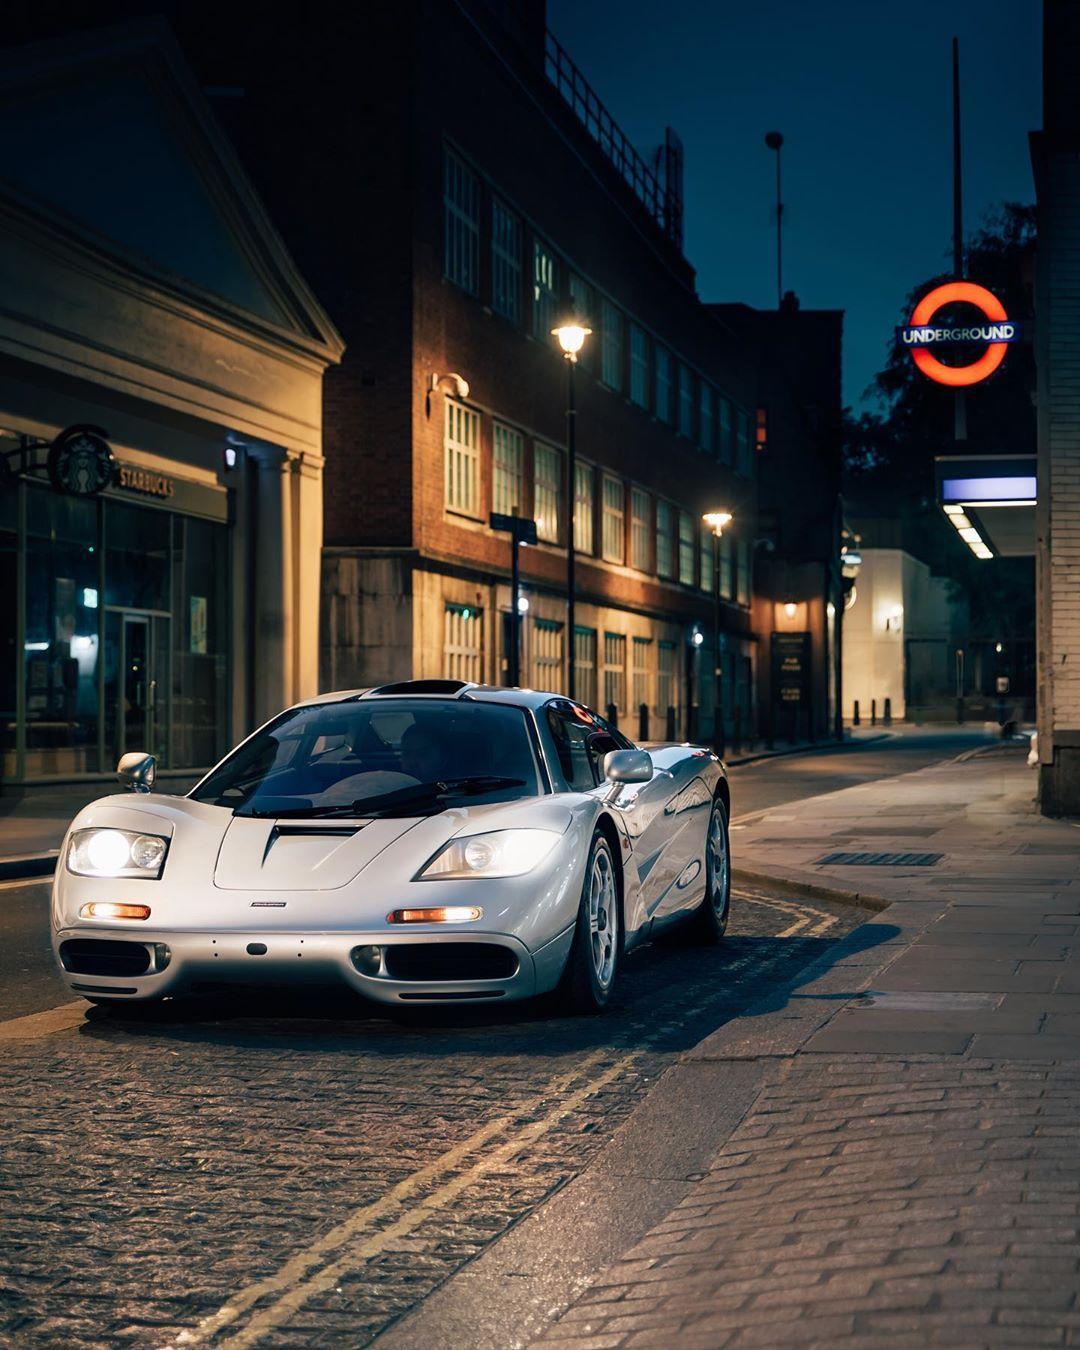 Late Night London Allwayswong Official Mclaren F1 Mclaren F1 Car Photos Super Cars